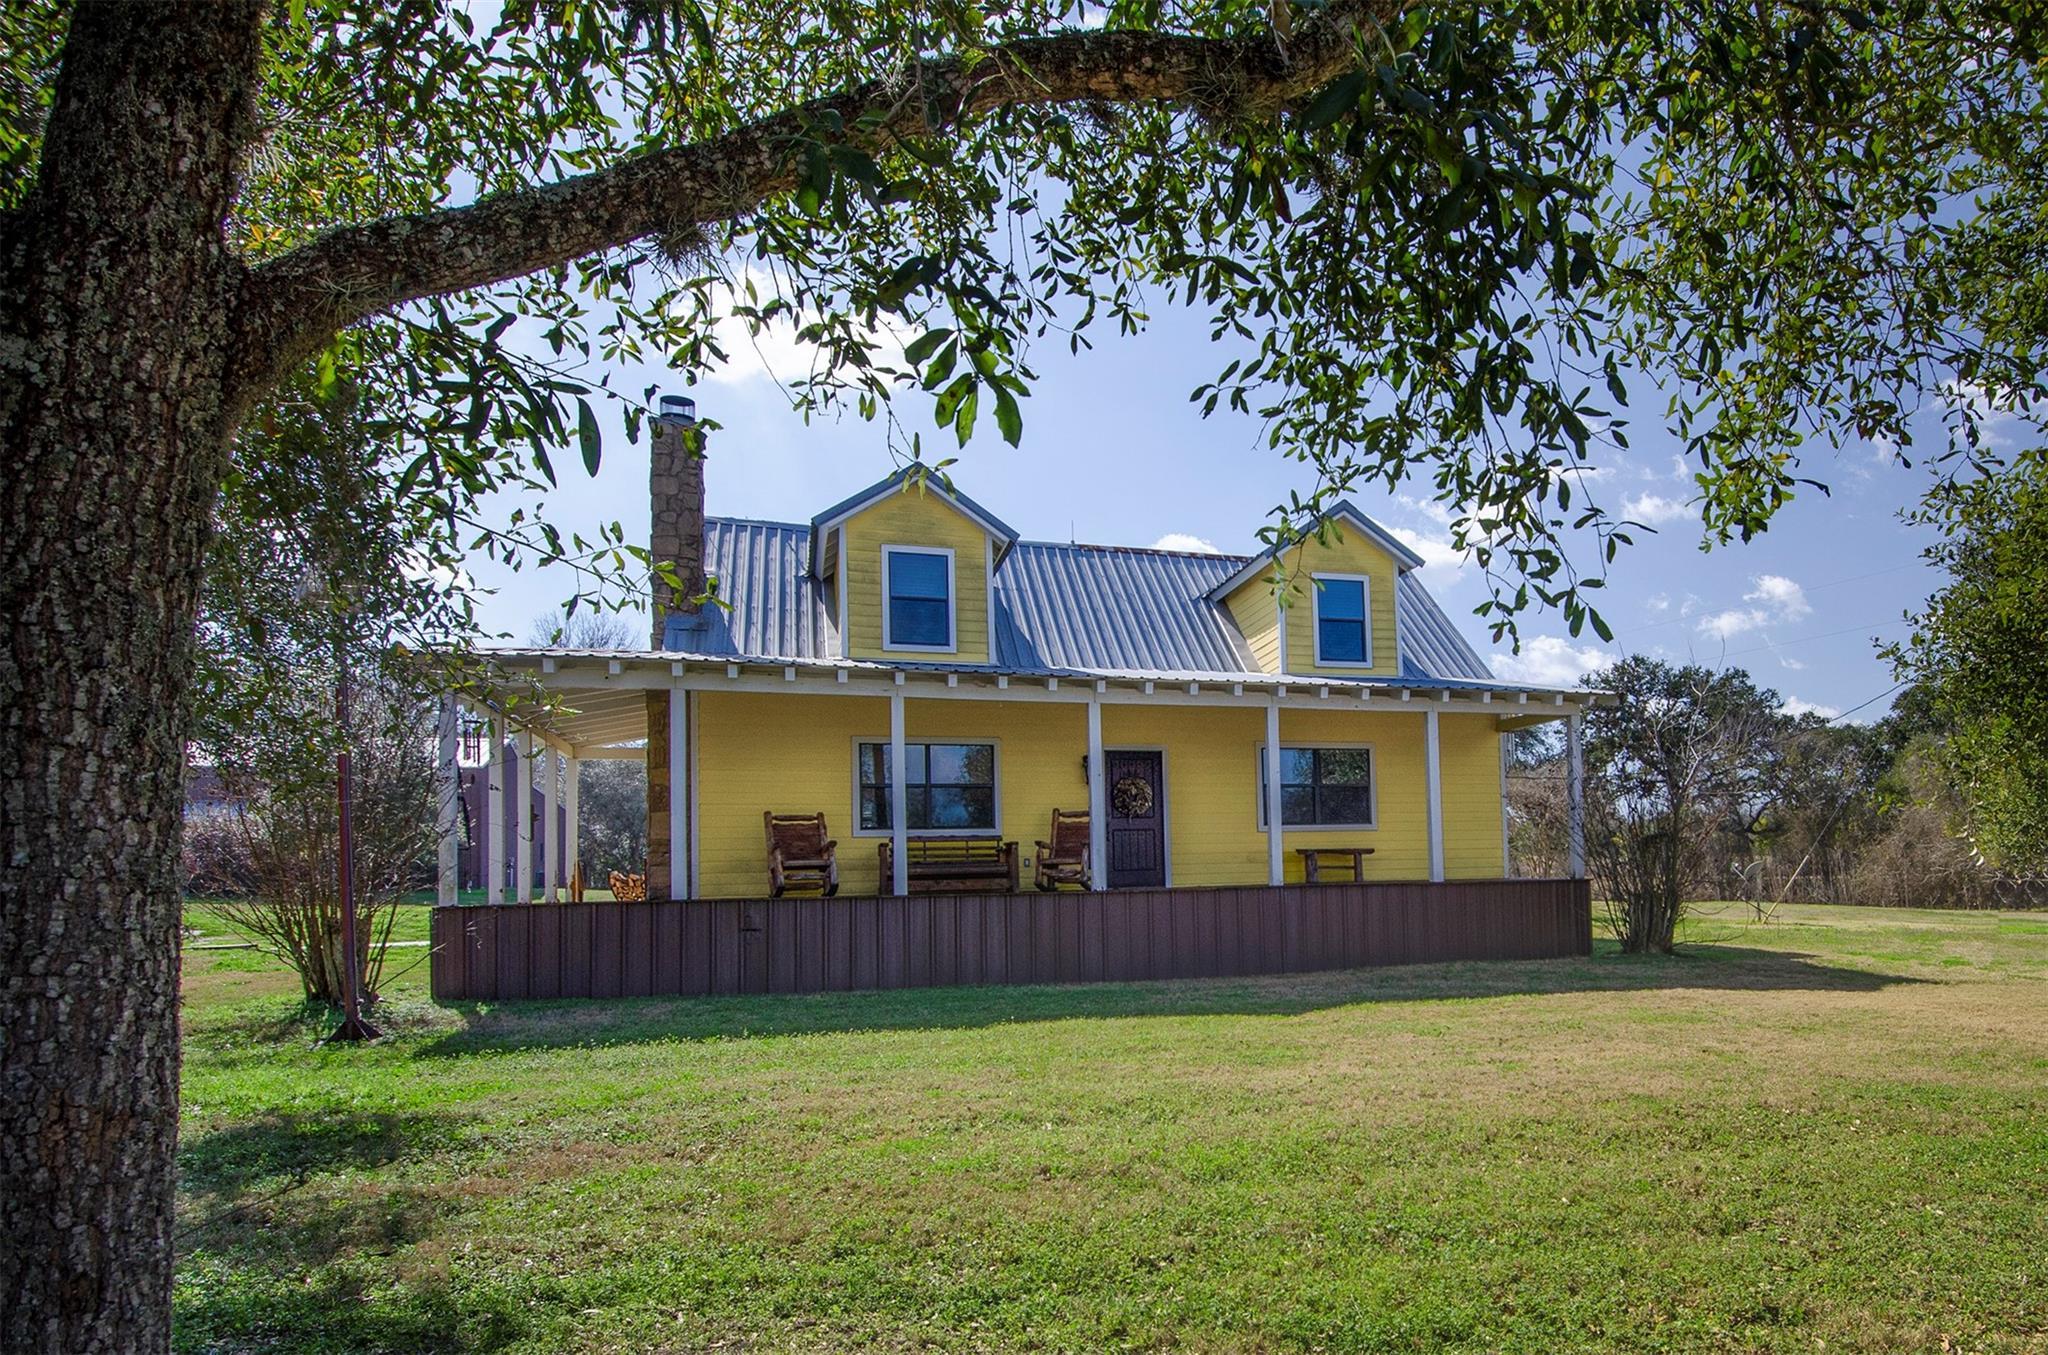 4280 Fm 390 E Property Photo 1